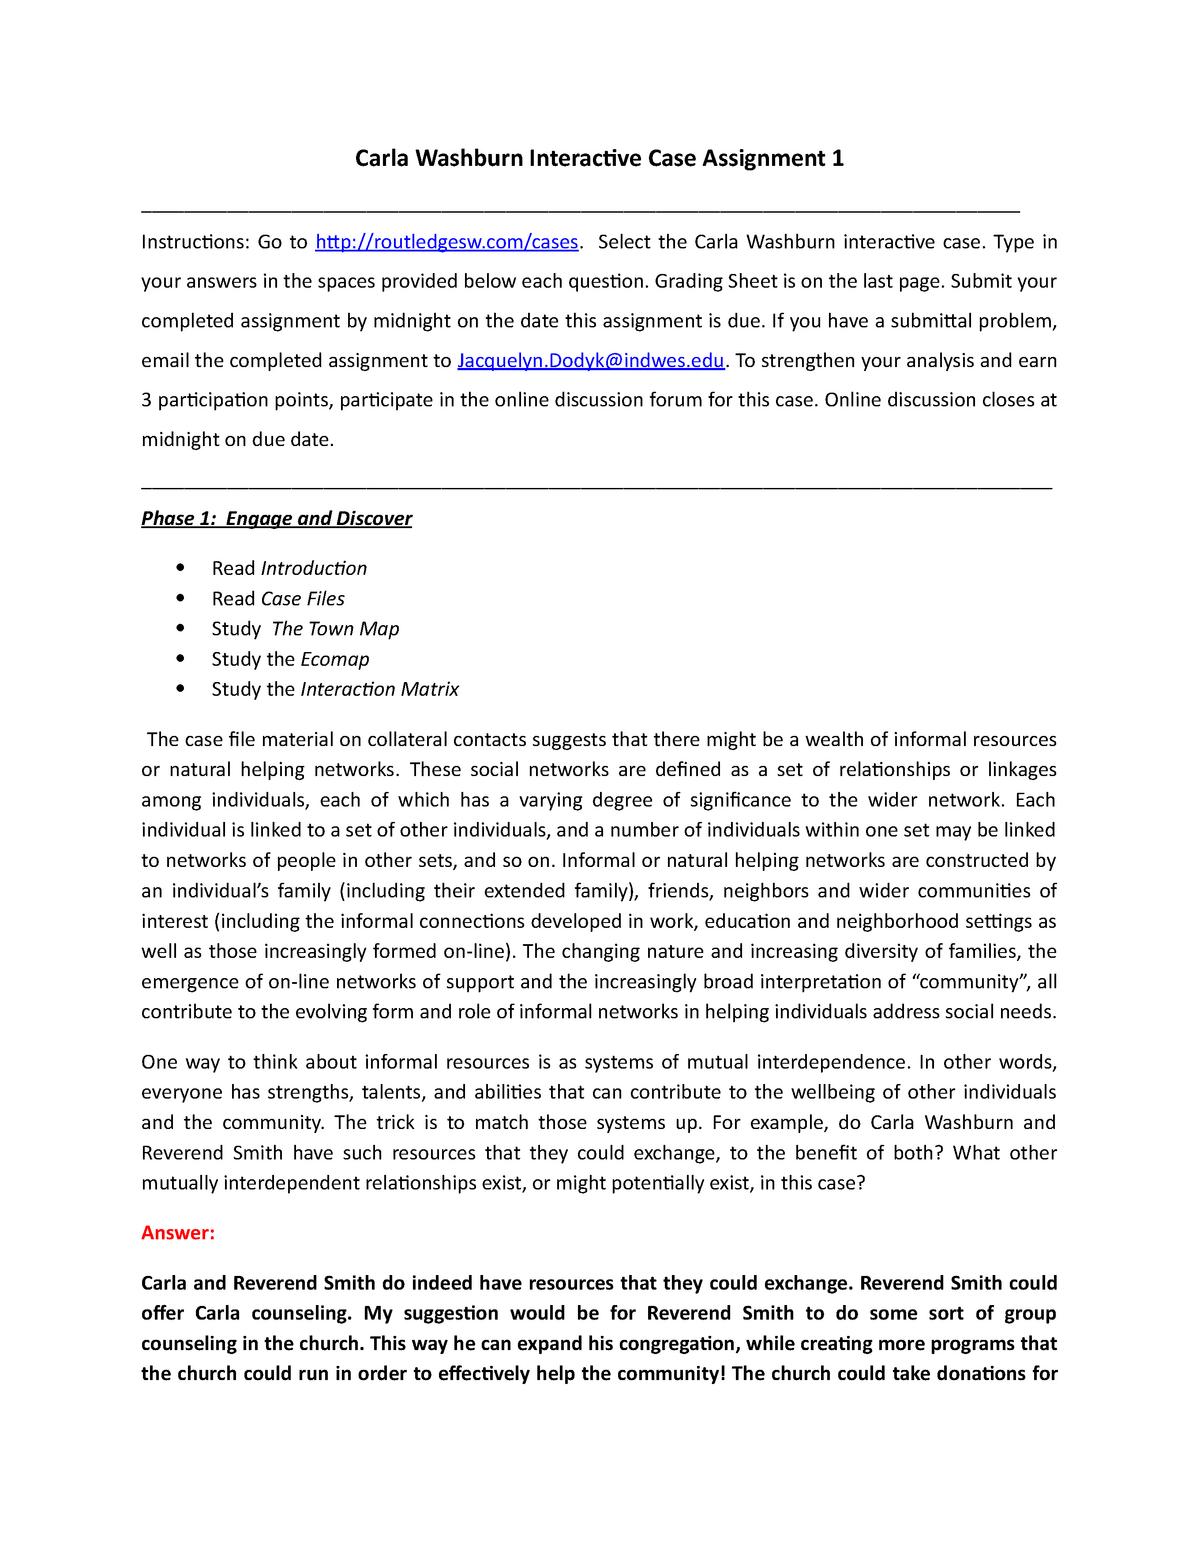 Case 1 - Carla Washburn - Jackie Dodyk - SWK 336: Social Policy